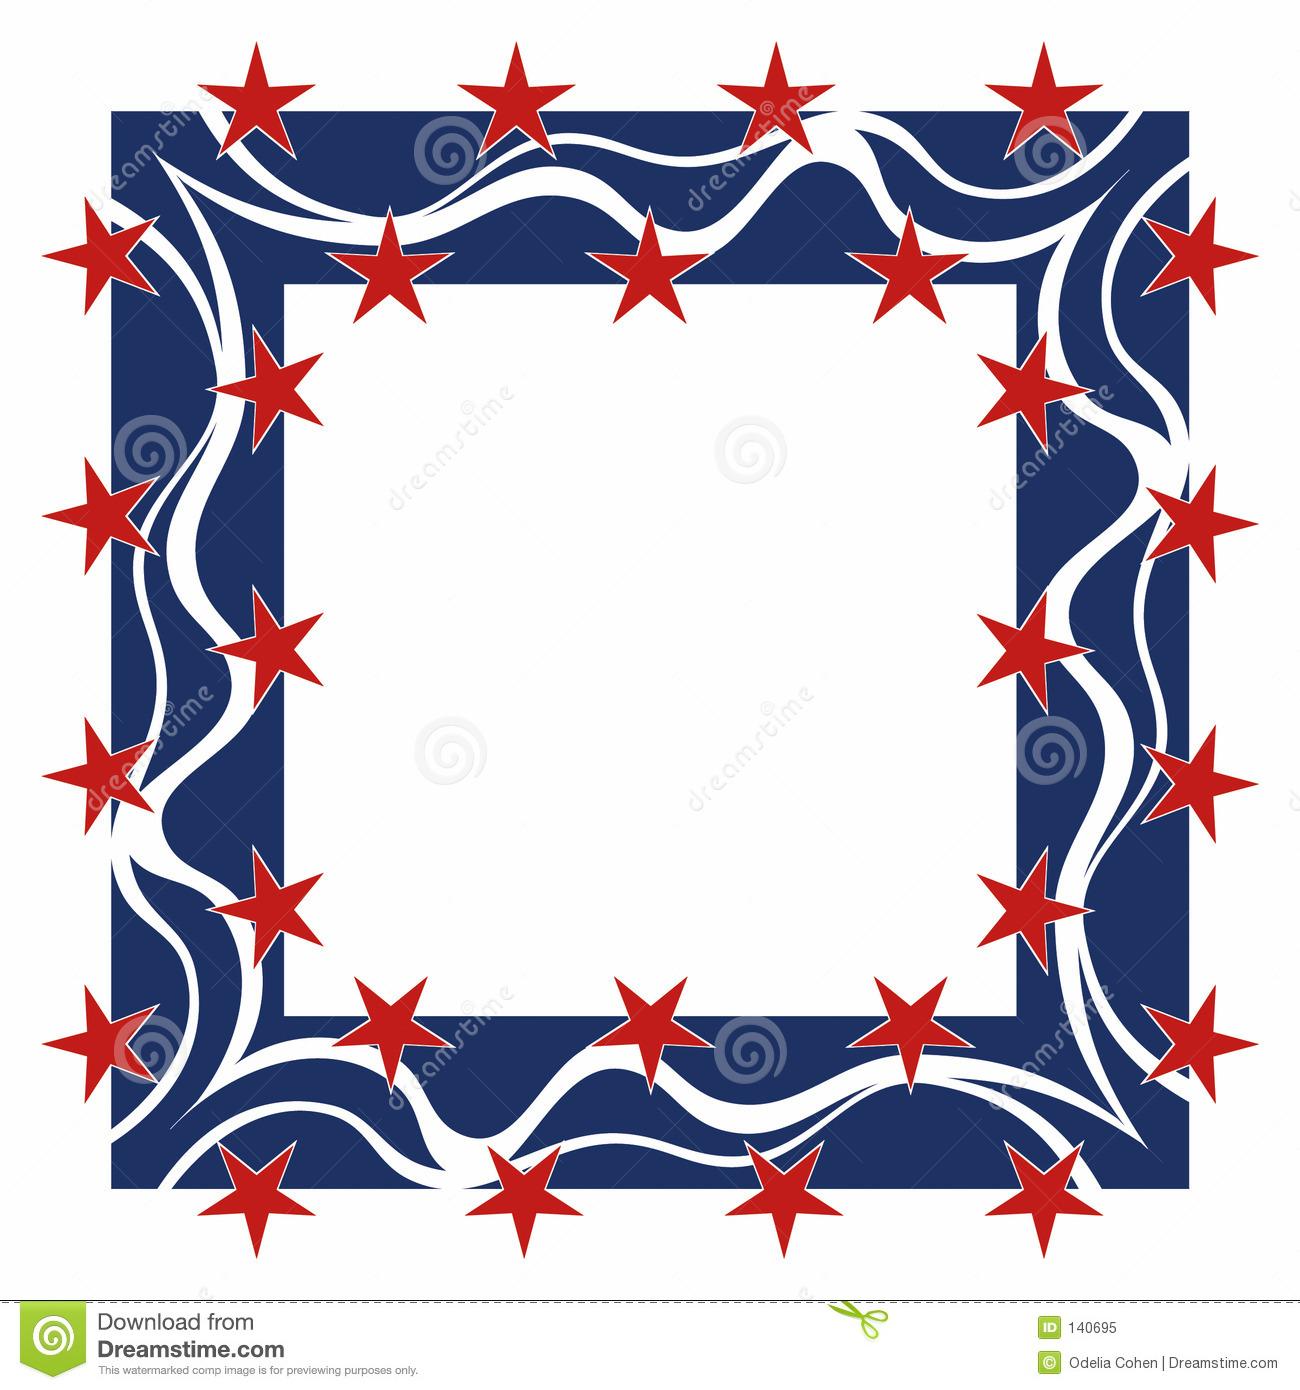 1300x1390 Patriotic Images Free Collection.michele Bilyeu Creates. Patriotic